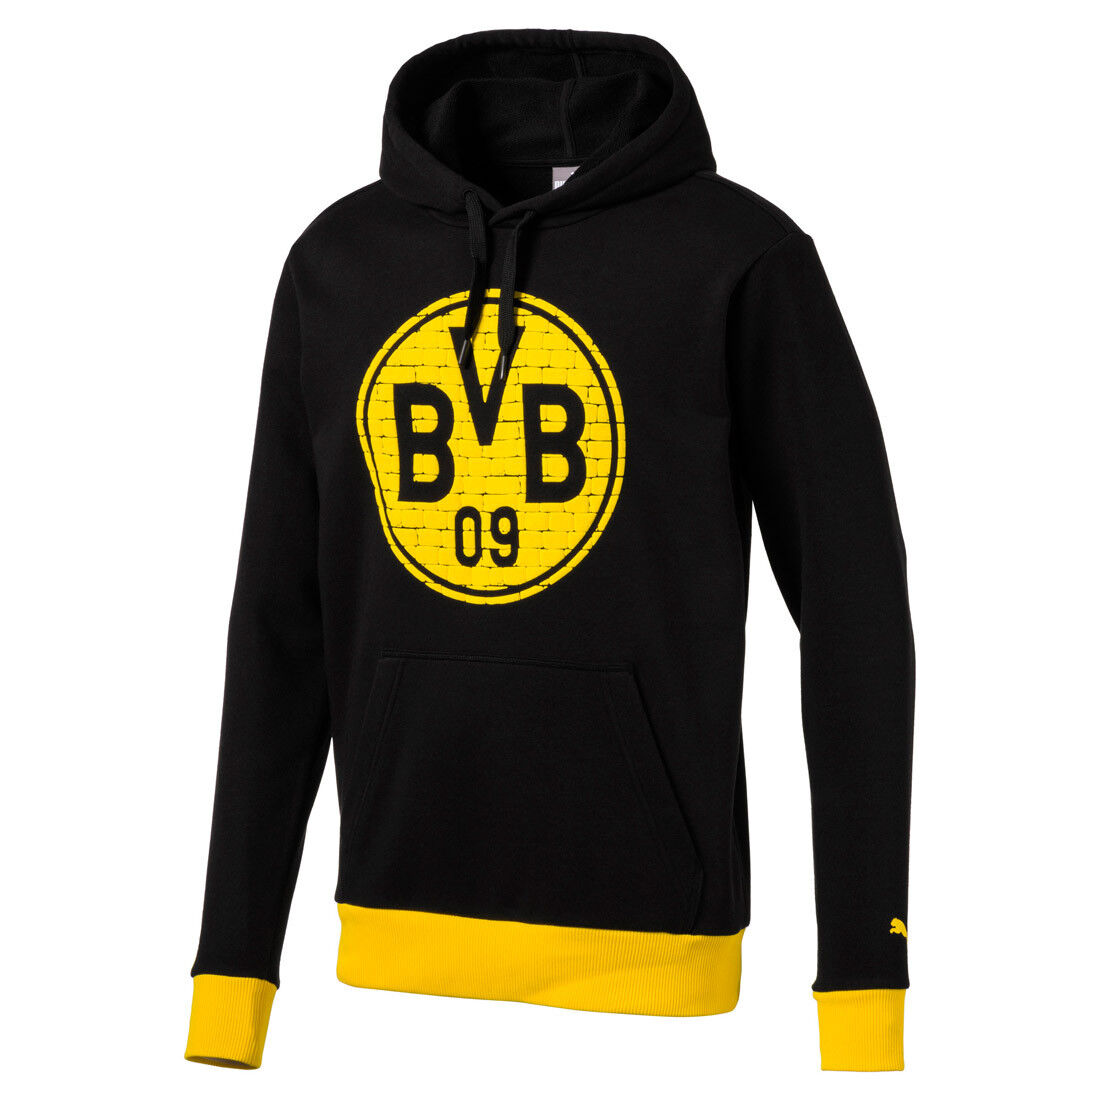 Puma BVB Fan Hoody Borussia Dortmund 09 Herren Sweatshirt 752863 12  | Online-verkauf